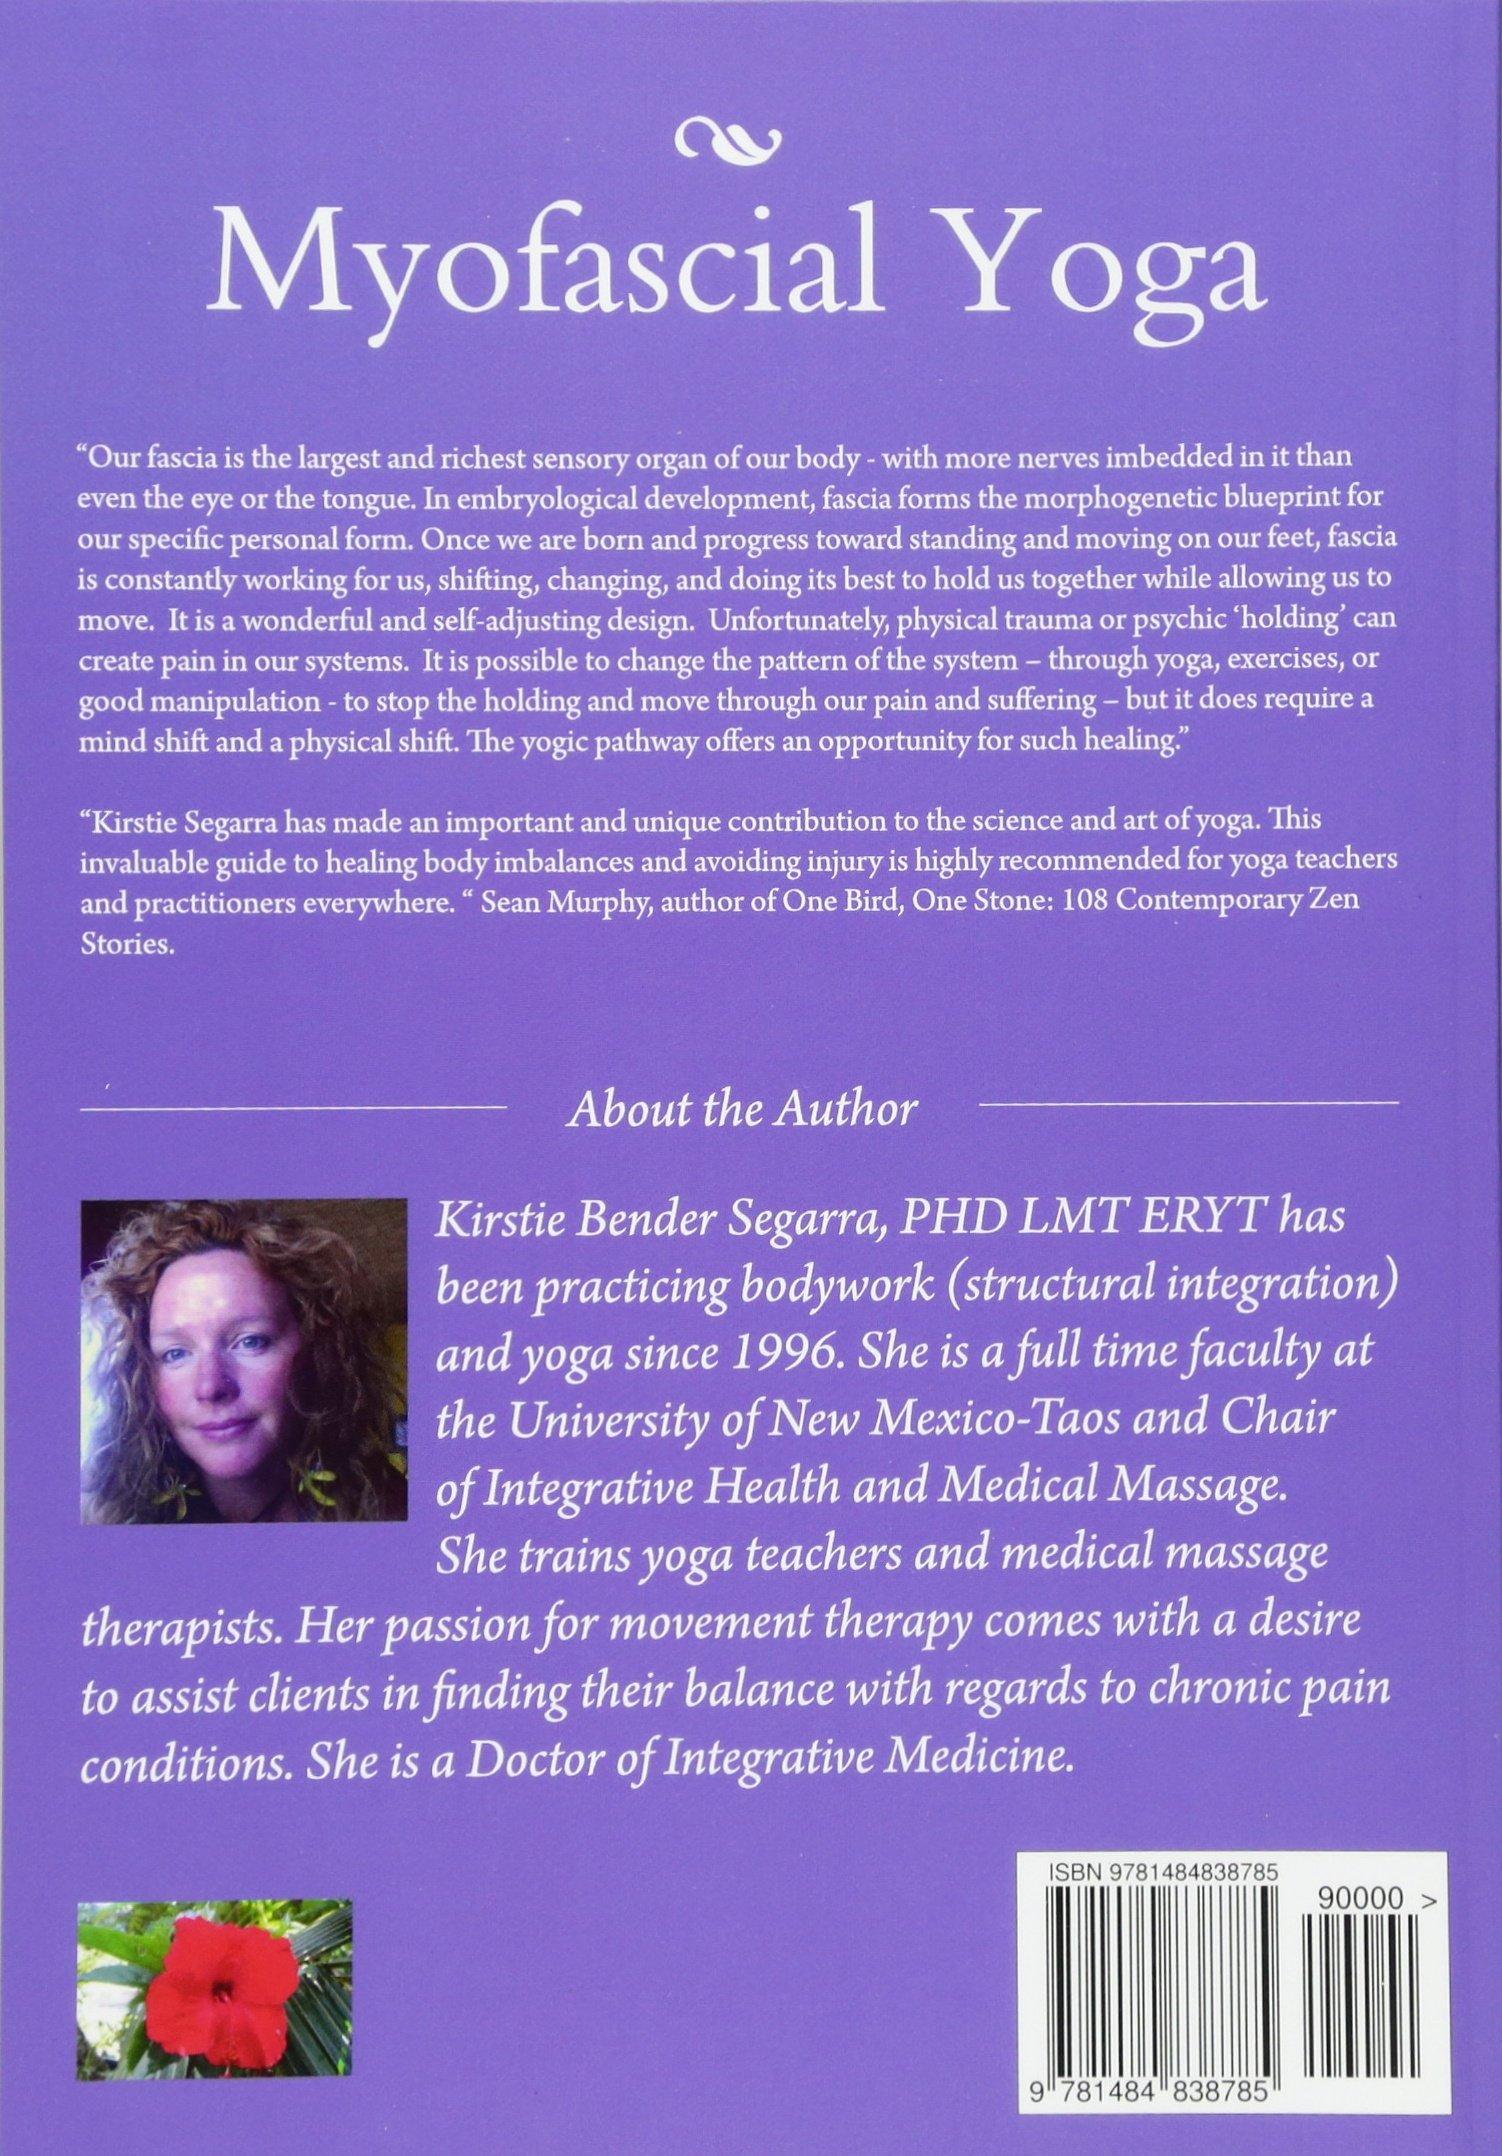 myofascial yoga a movement and yoga therapists guide to asana